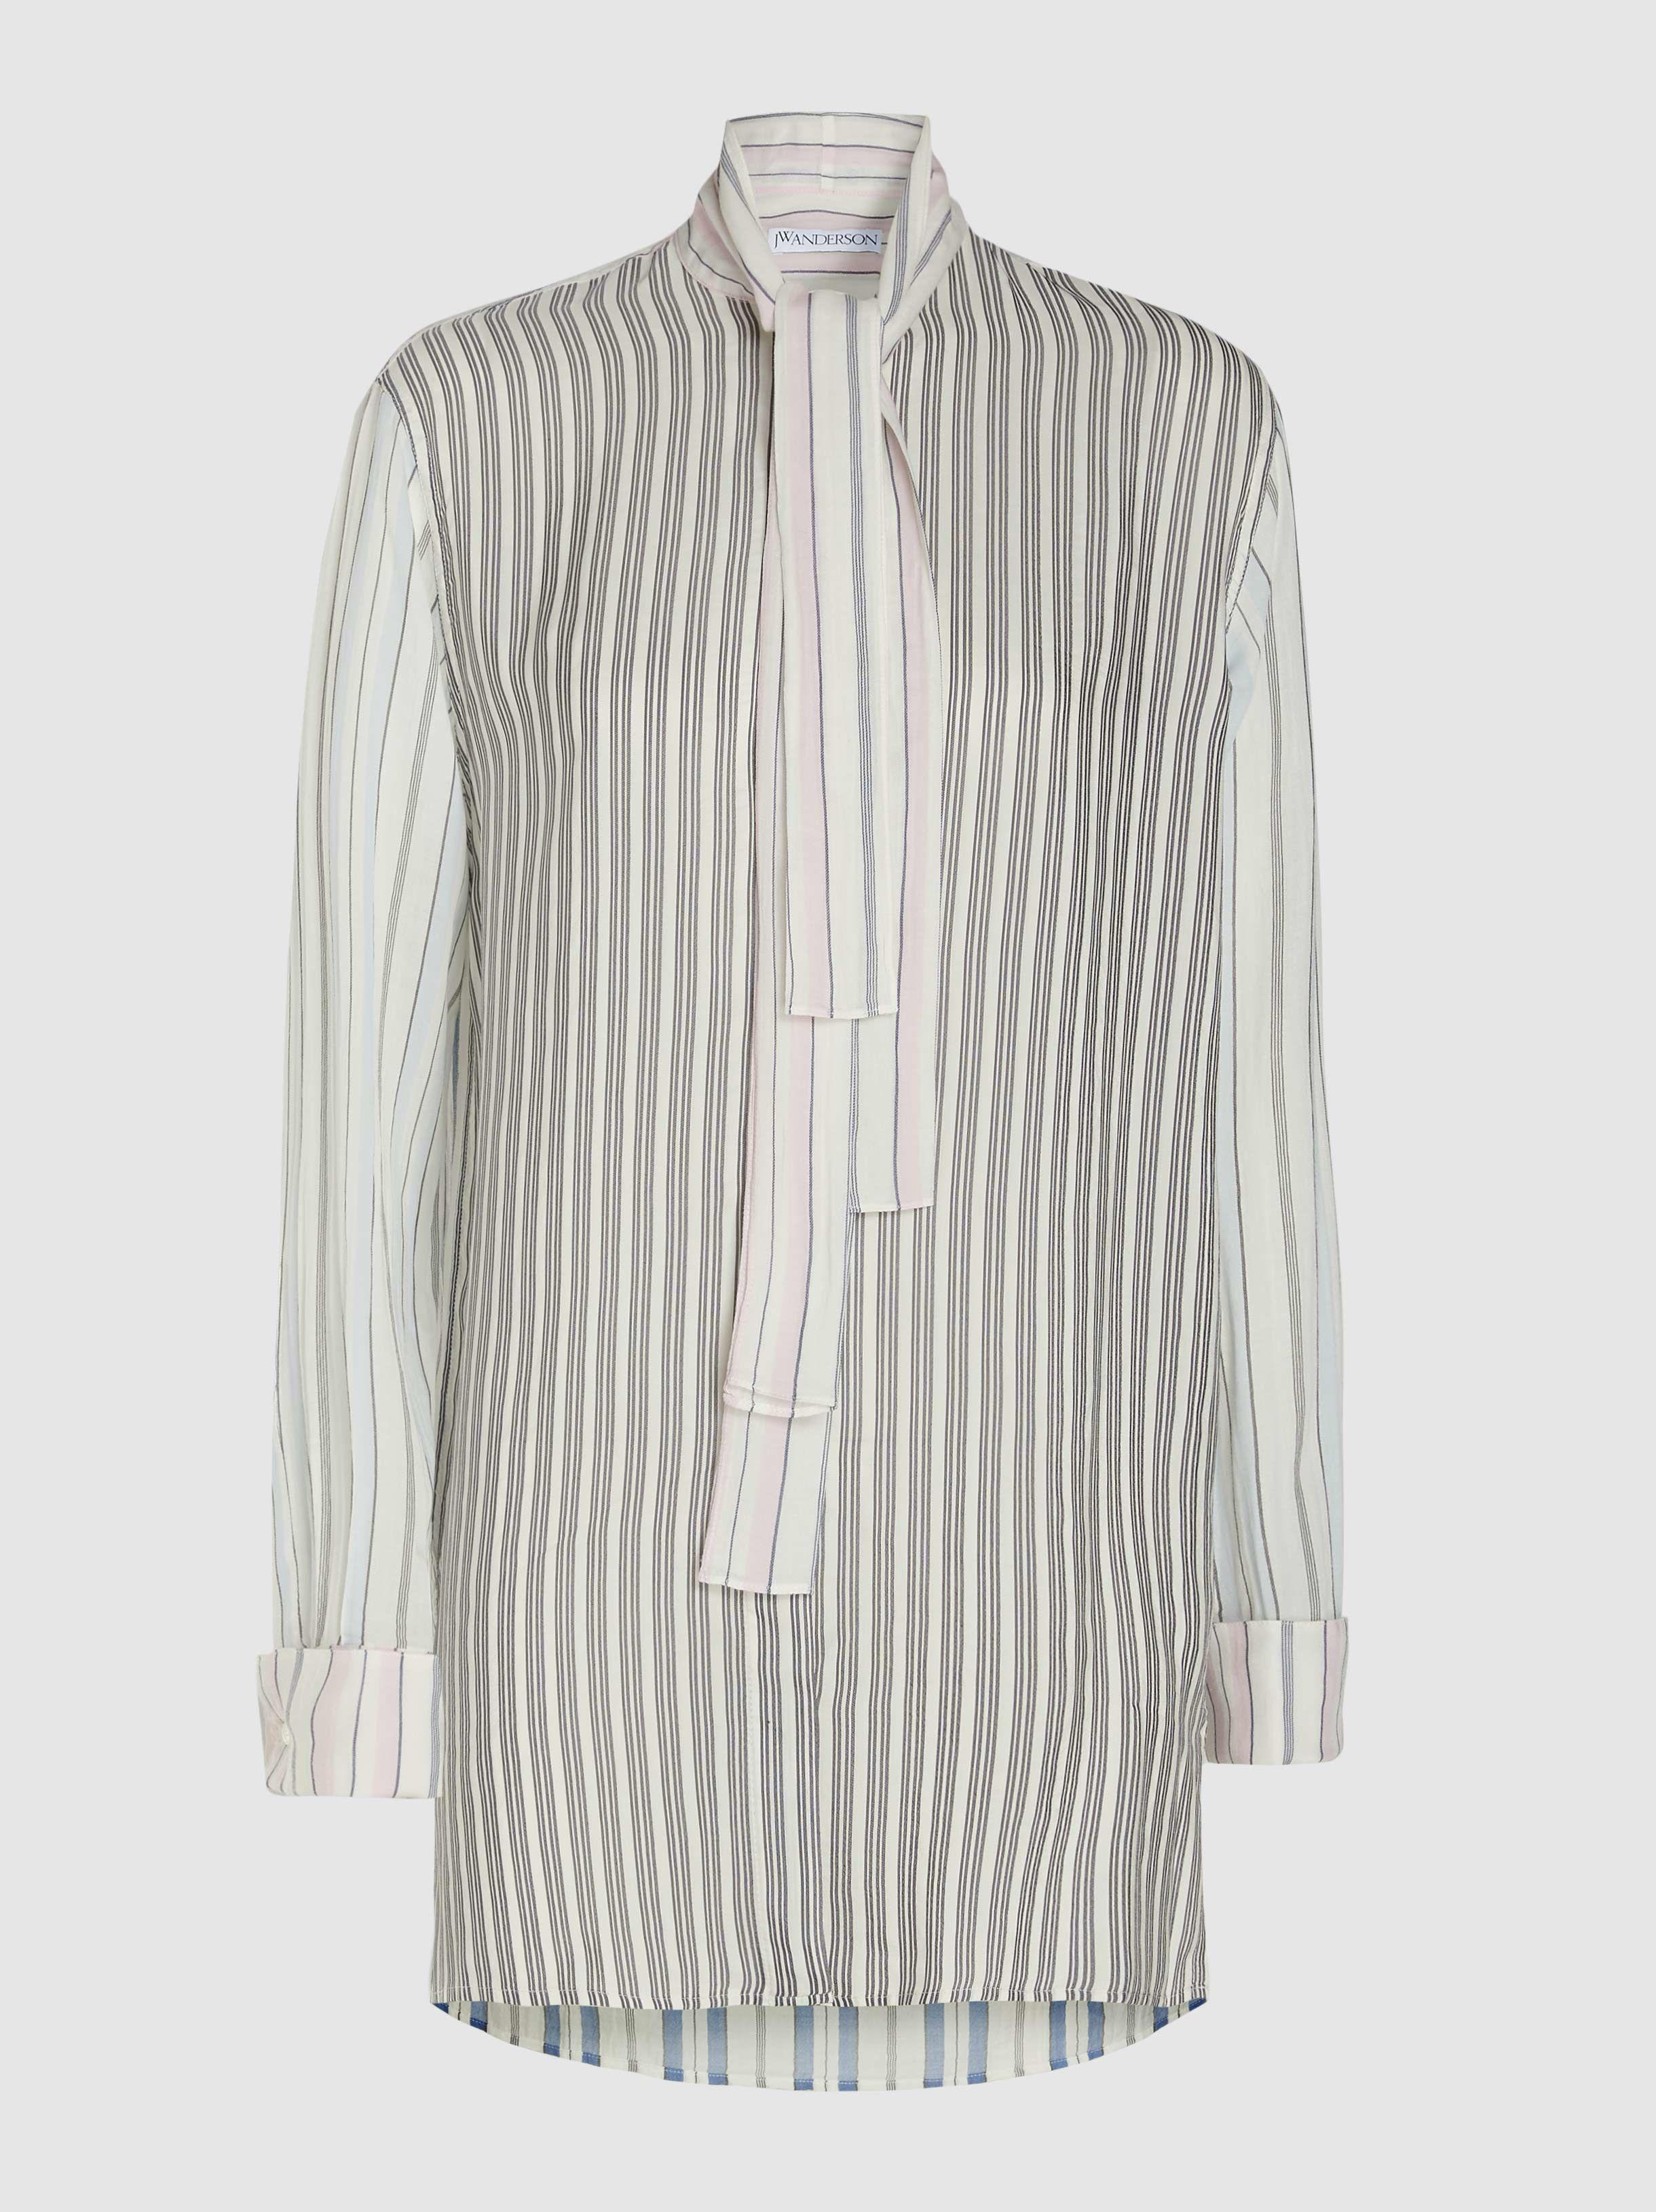 806d509cb9 JW Anderson. Women s Pyjama Striped Button Down Cotton Shirt